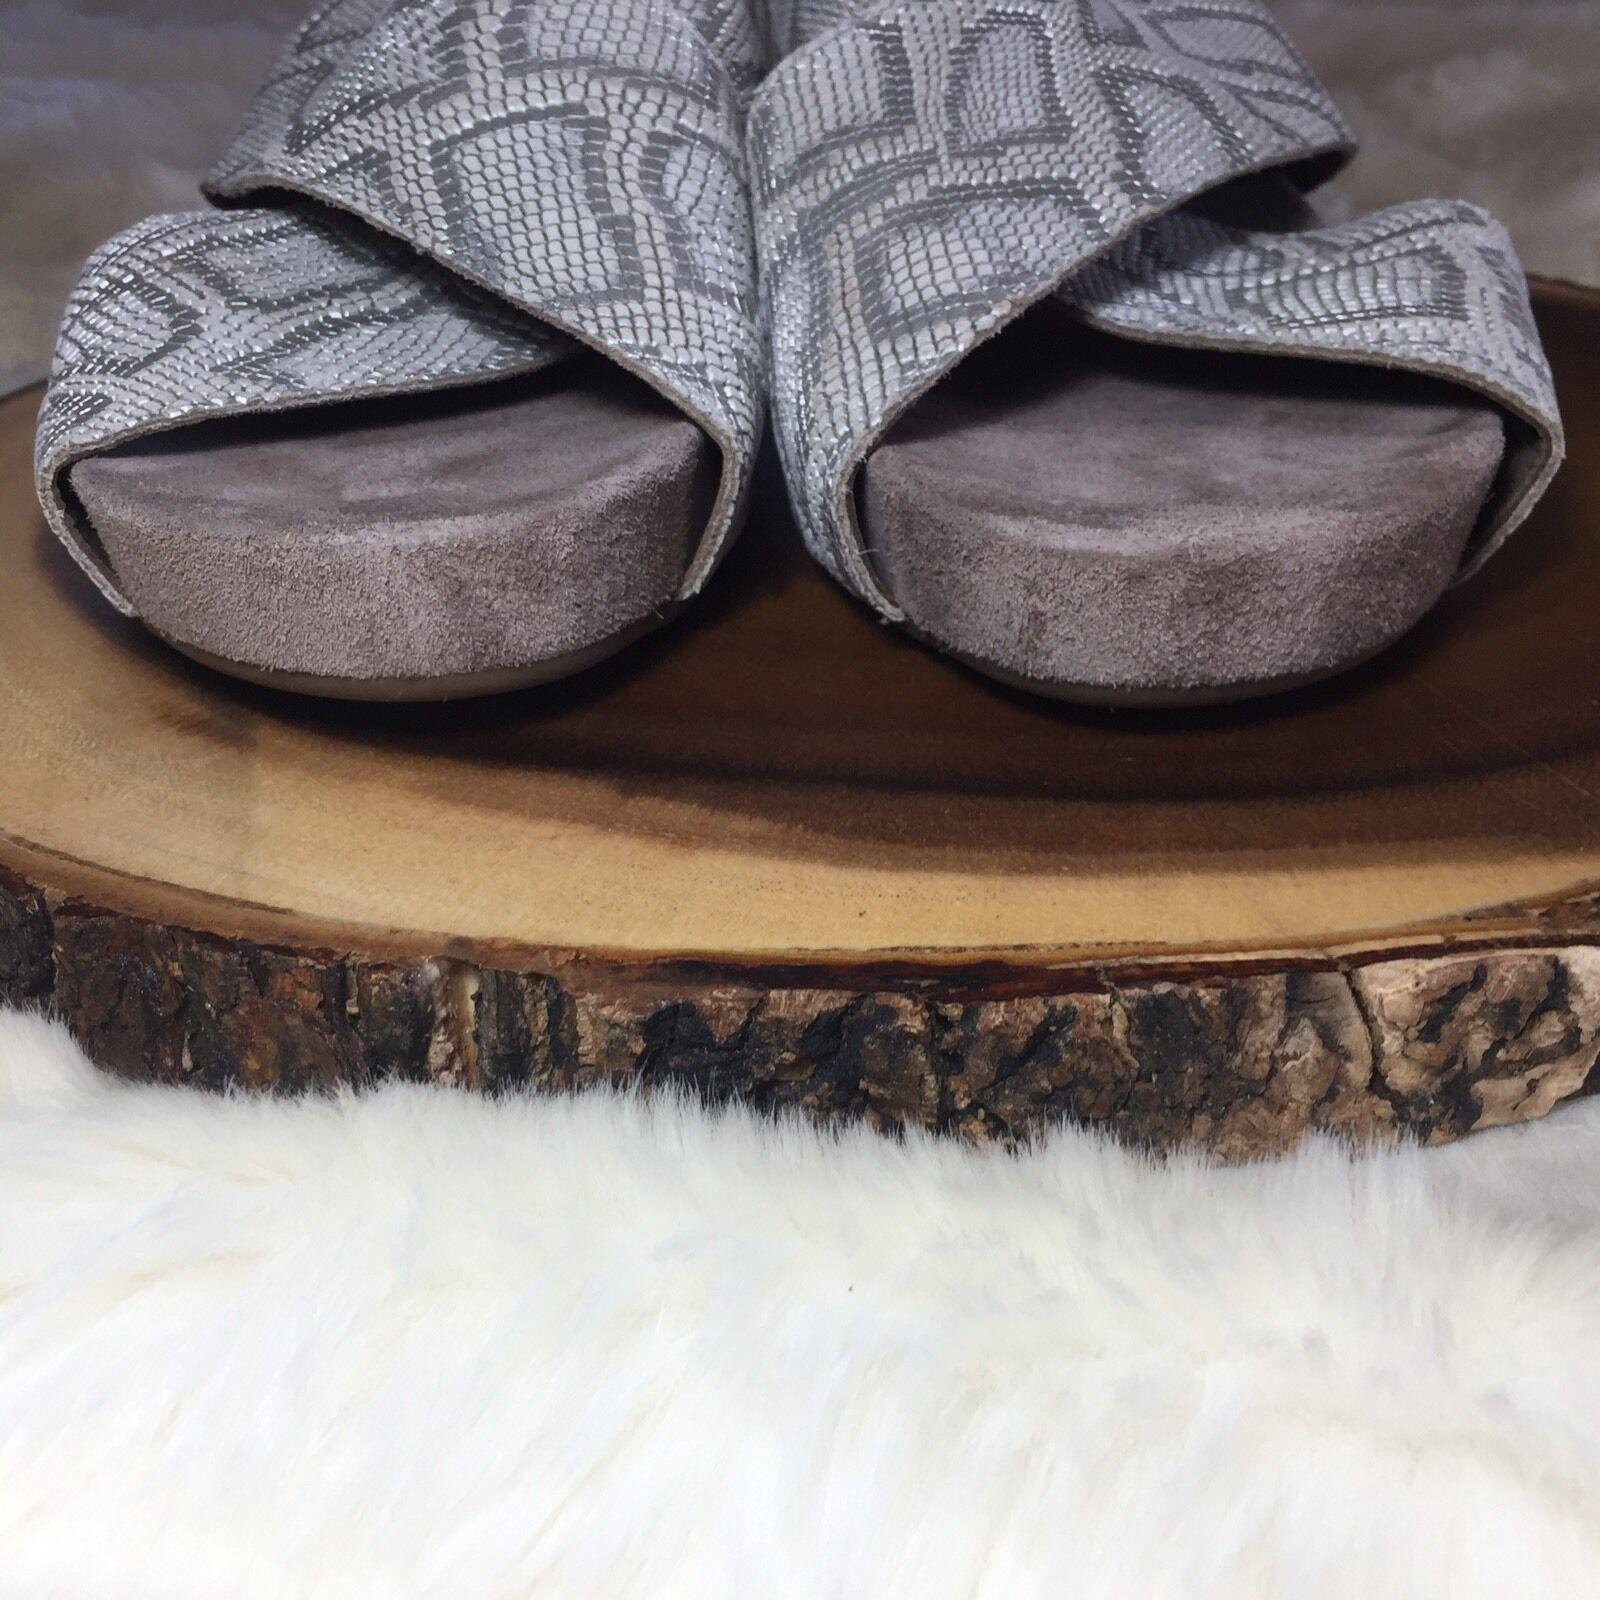 New MEPHISTO Belina 42 Slingback Wedge Sandals 42 Belina Embossed Reptile Grey Python b80315